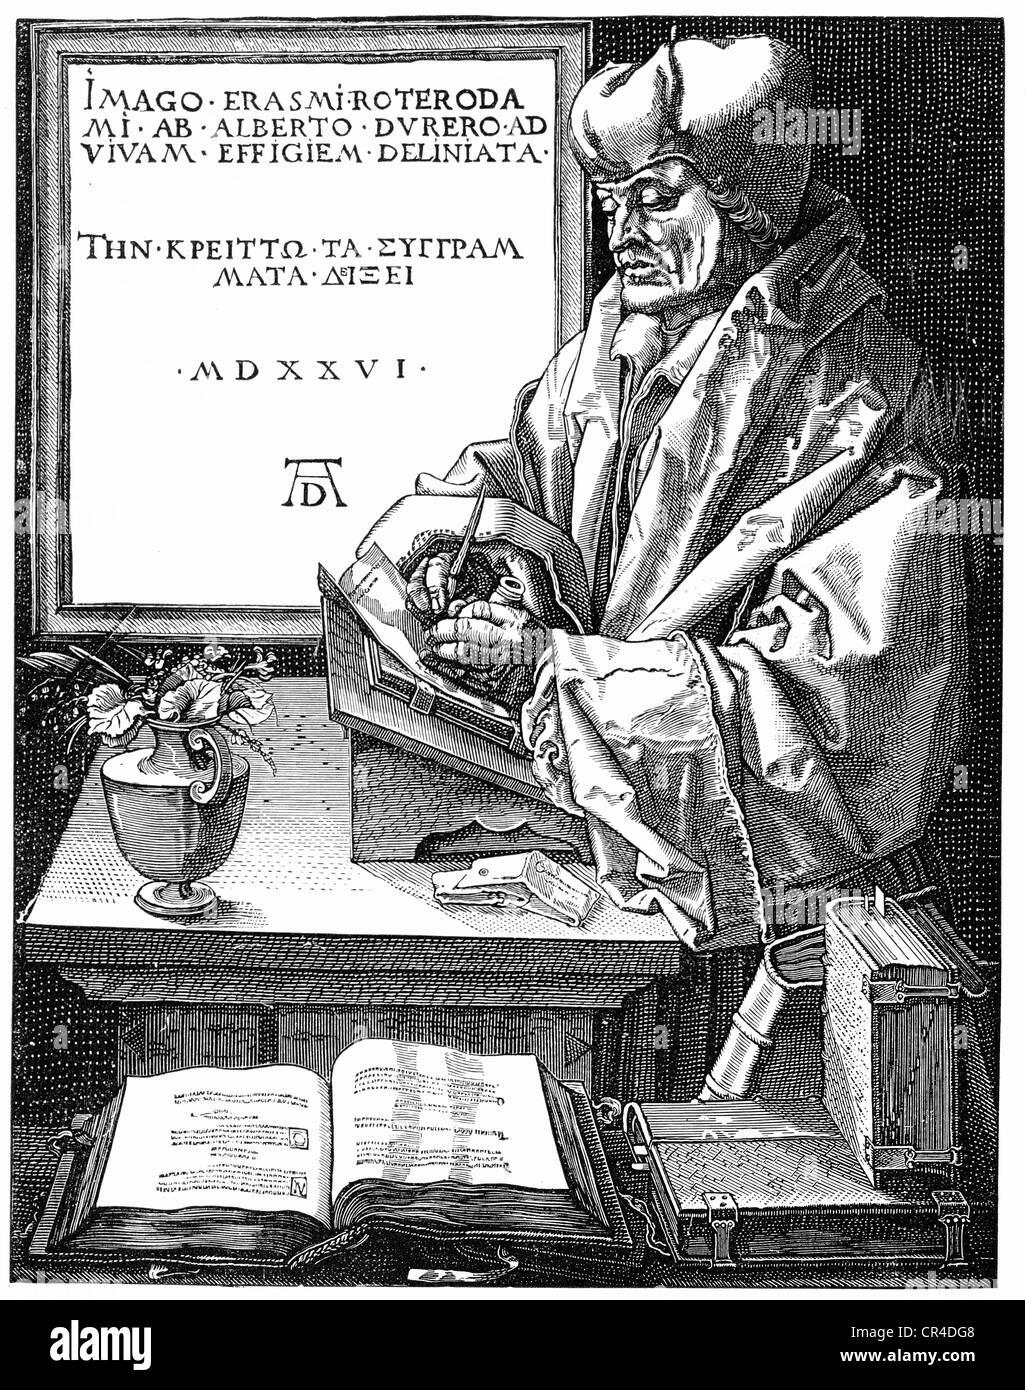 Erasmus von Rotterdam (1465 oder 1469 -1536) after an engraving by Albrecht Duerer - Stock Image